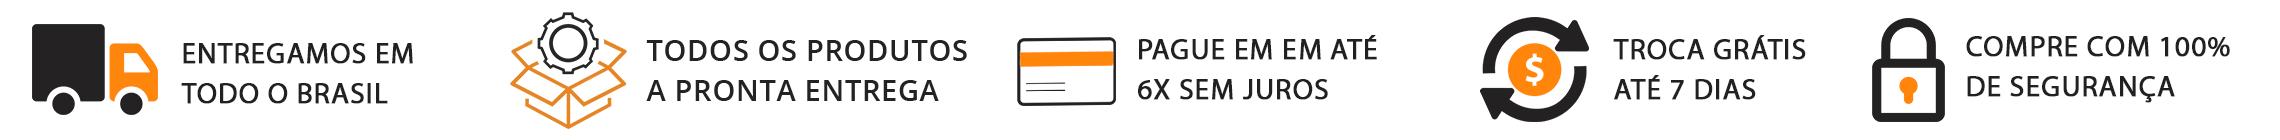 Banner Tarja 2019.09 - 6x